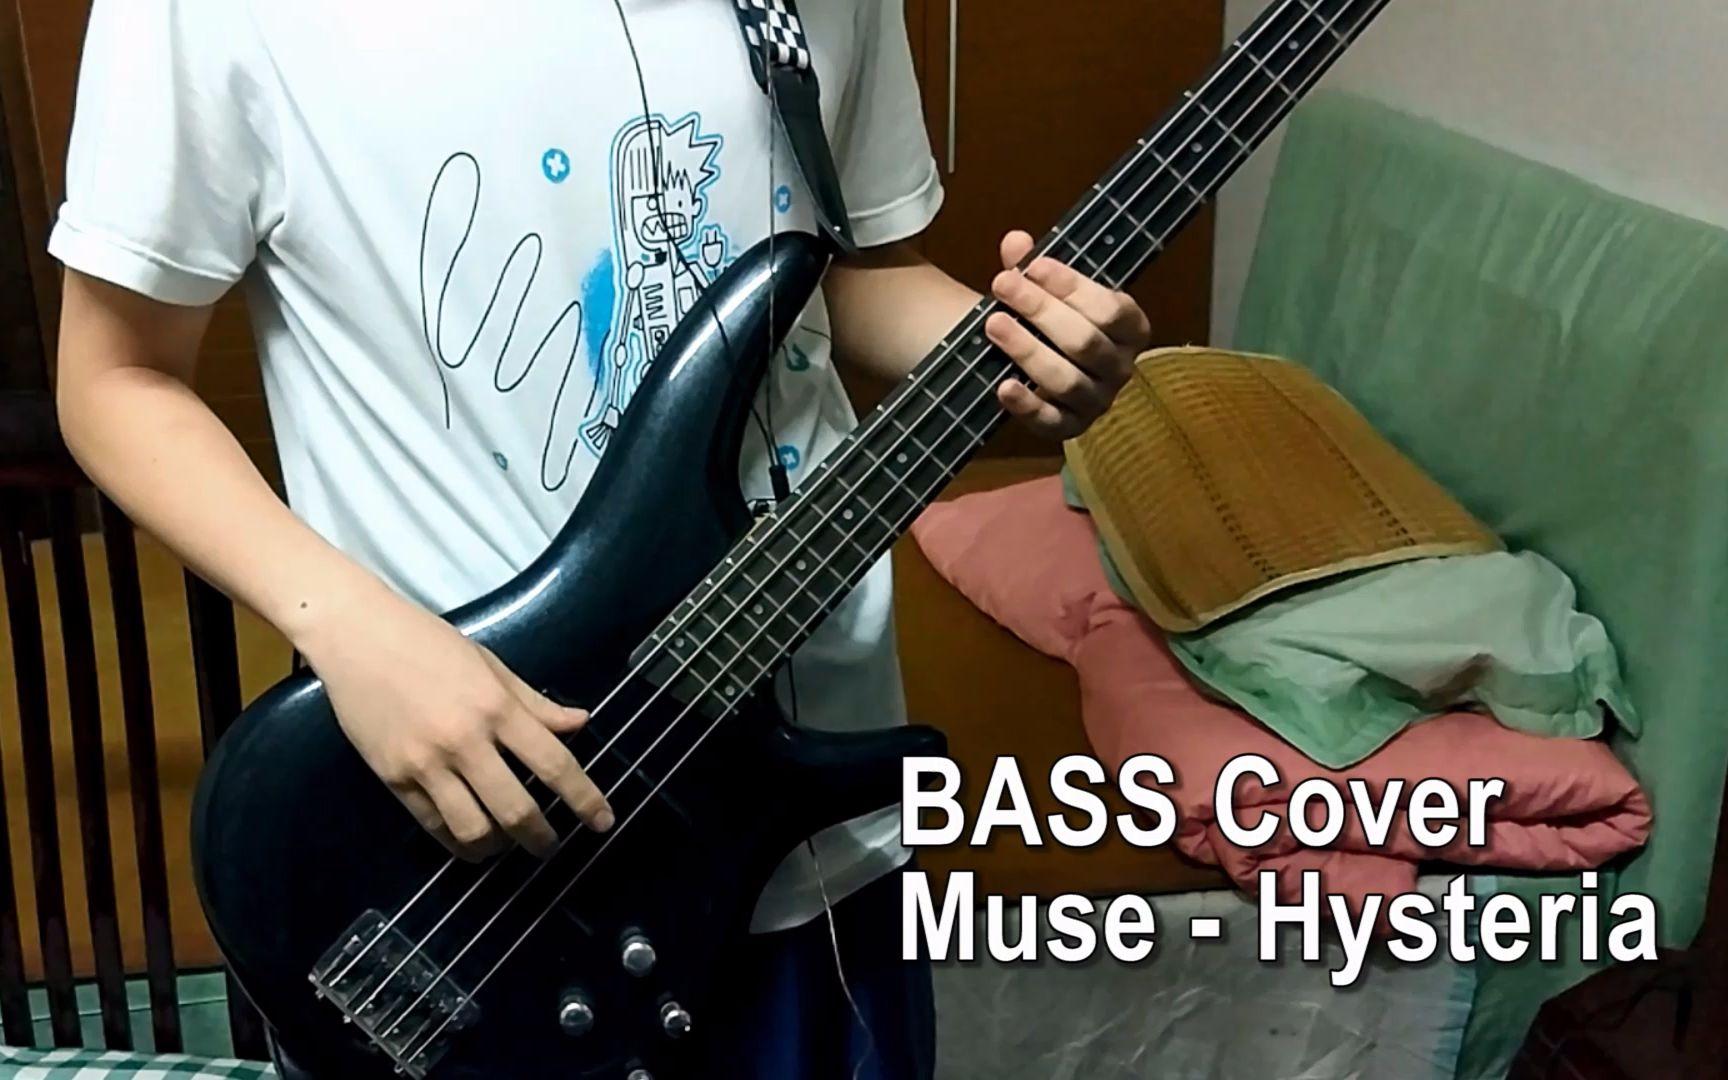 BASS Cover】Muse - Hysteria_哔哩哔哩(゜-゜)つロ干杯~-bilibili